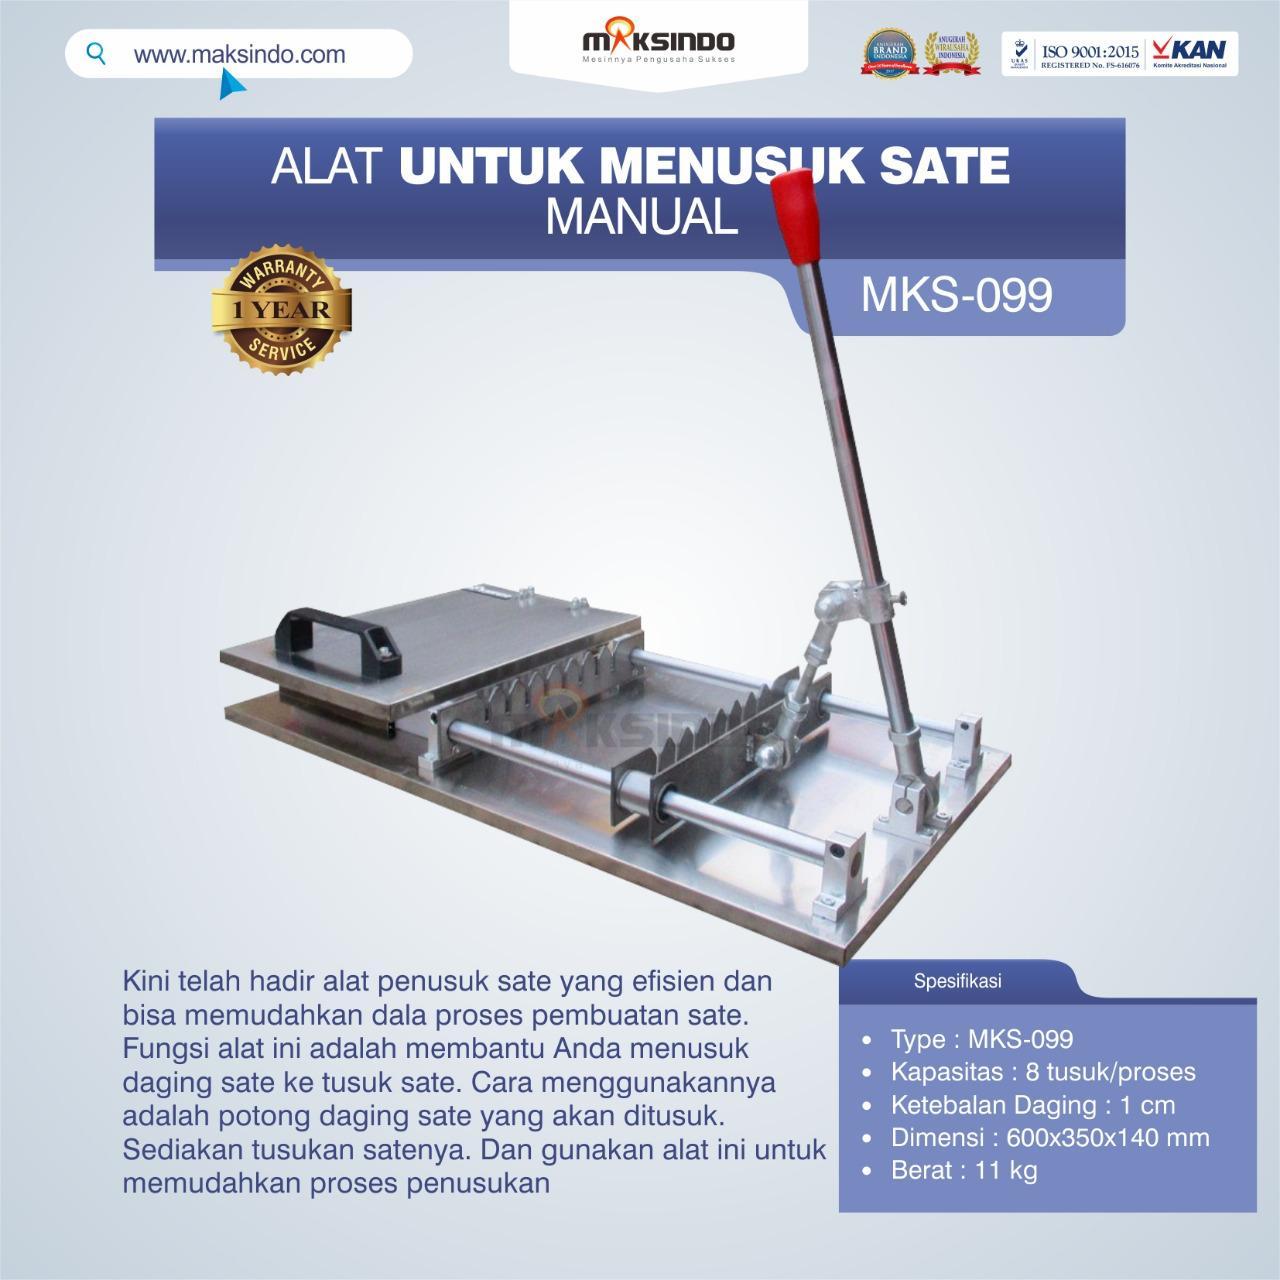 Jual Alat Tusuk Sate ManualMKS-099 di Malang